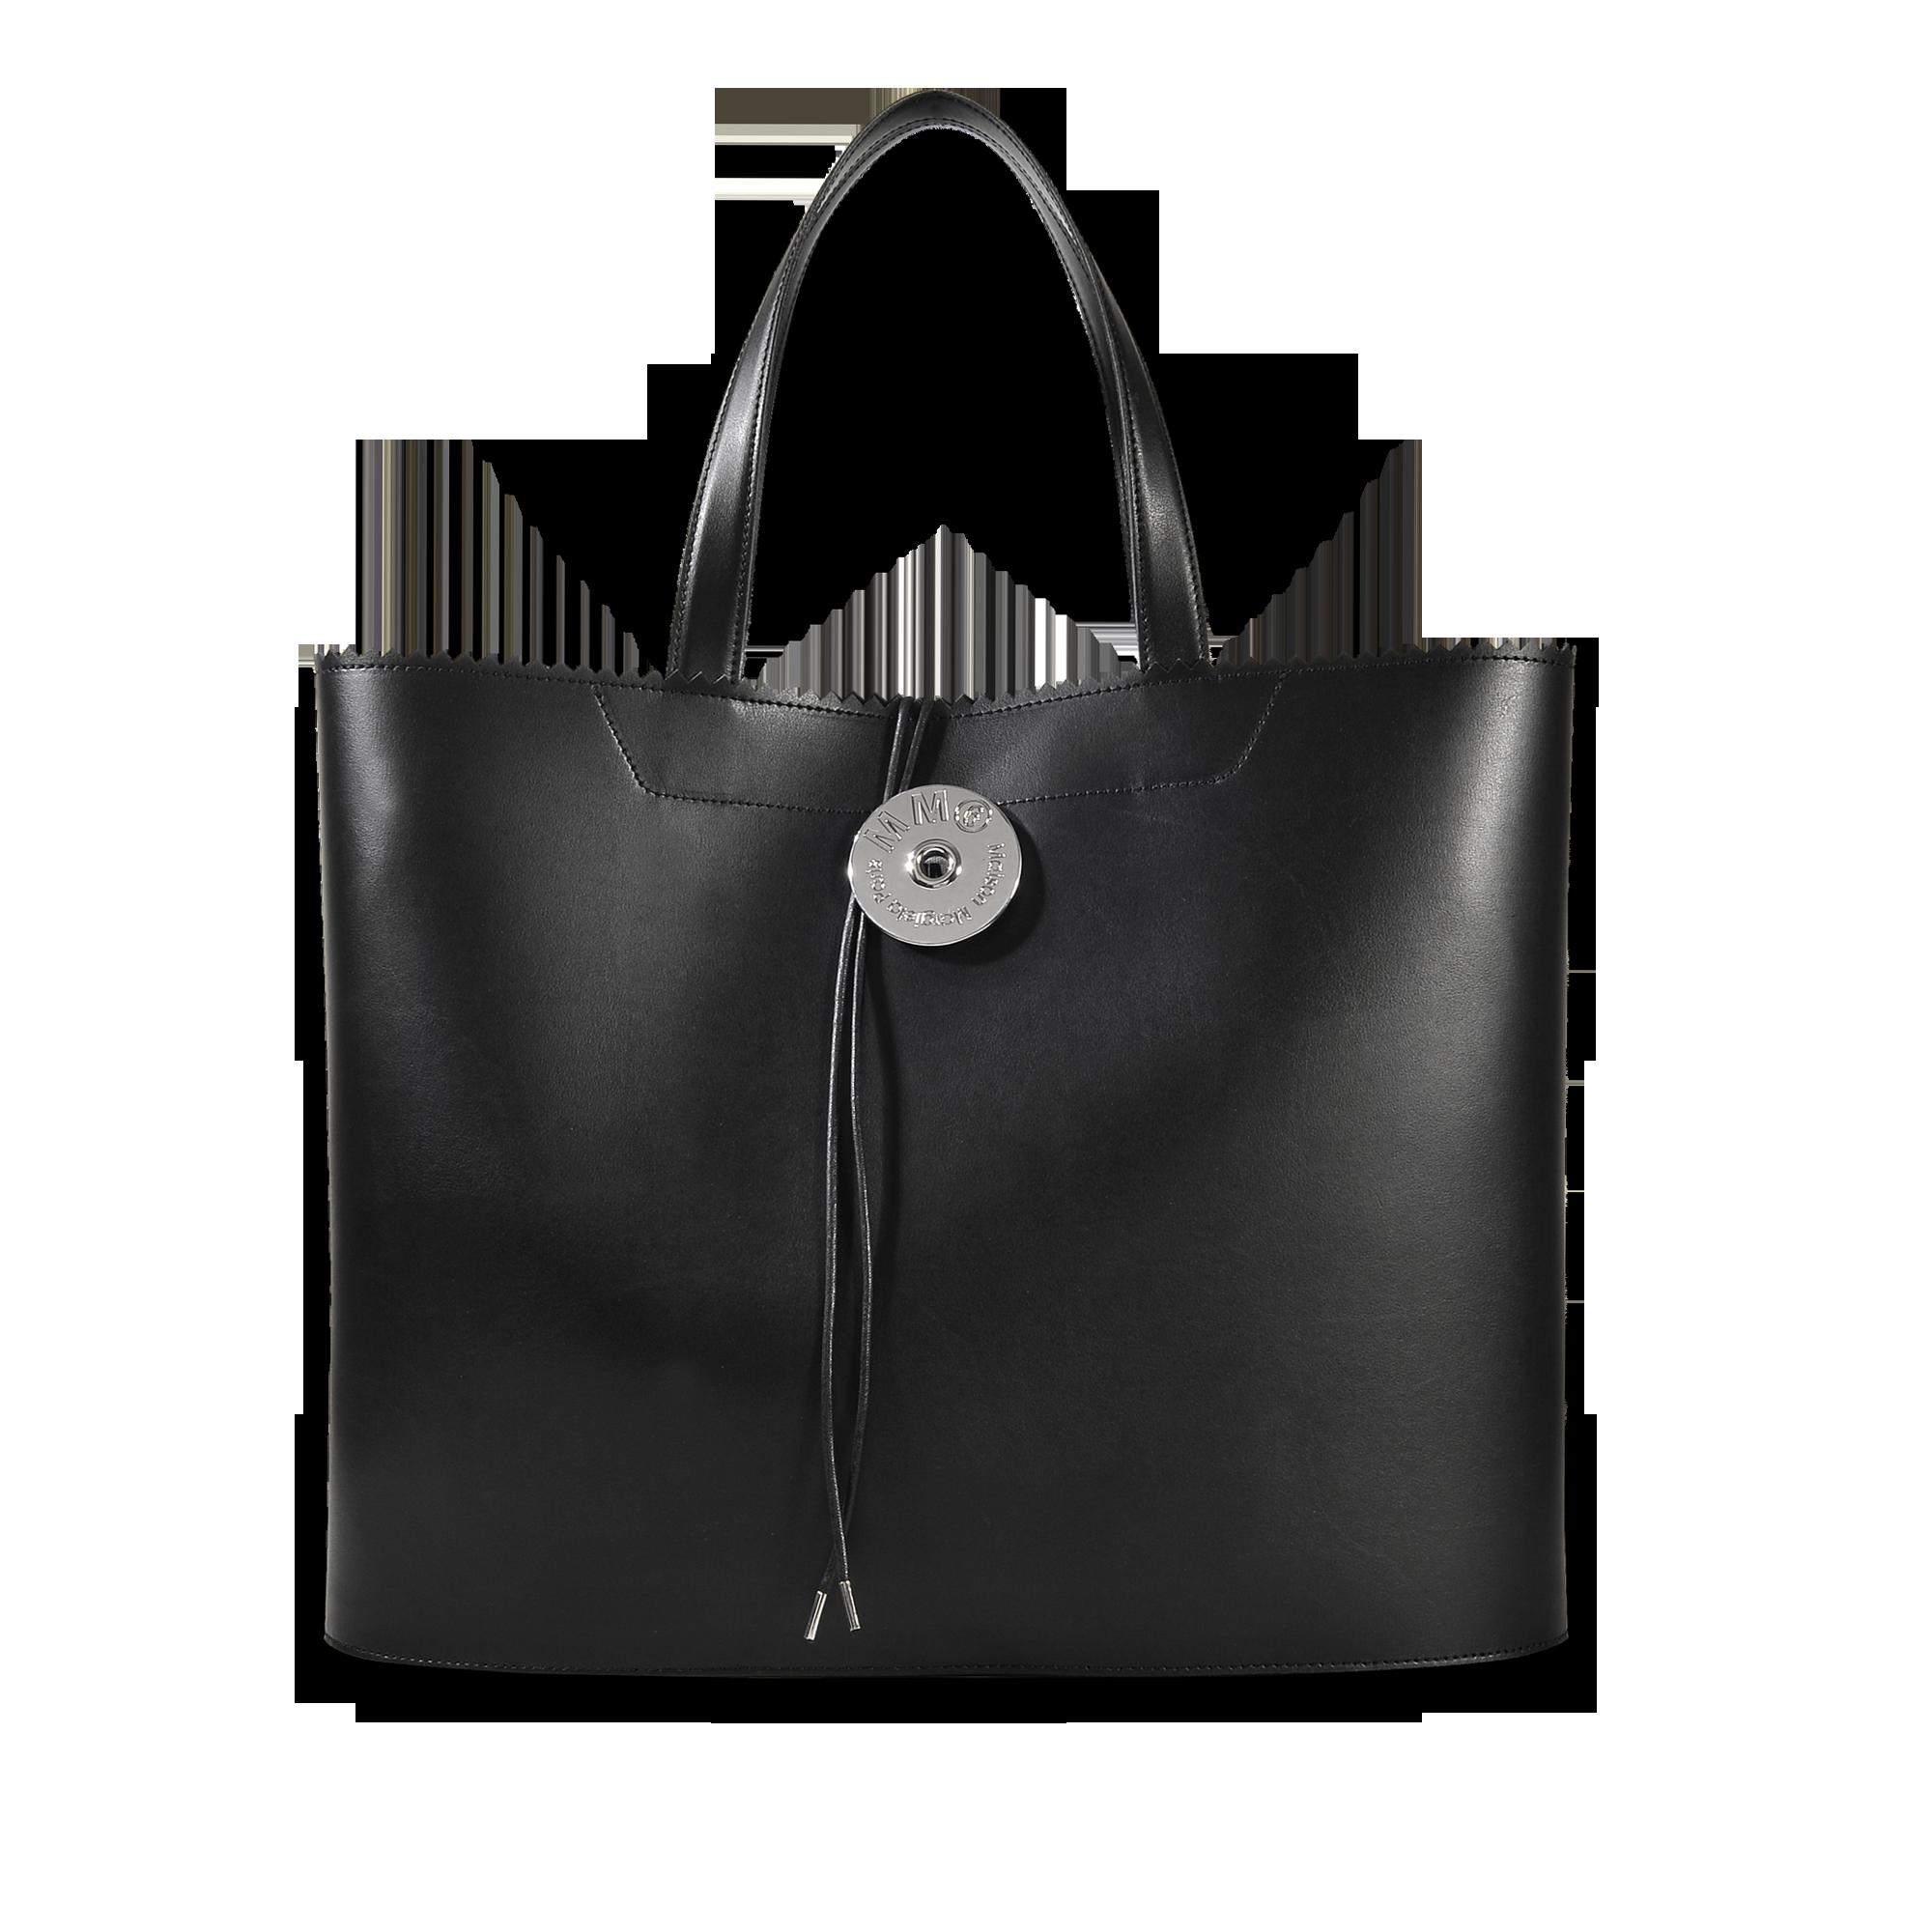 Goedkope Exclusieve Korting 2018 Nieuwste Mm6 Maison Margiela Large Shopper bag WpEdPeW